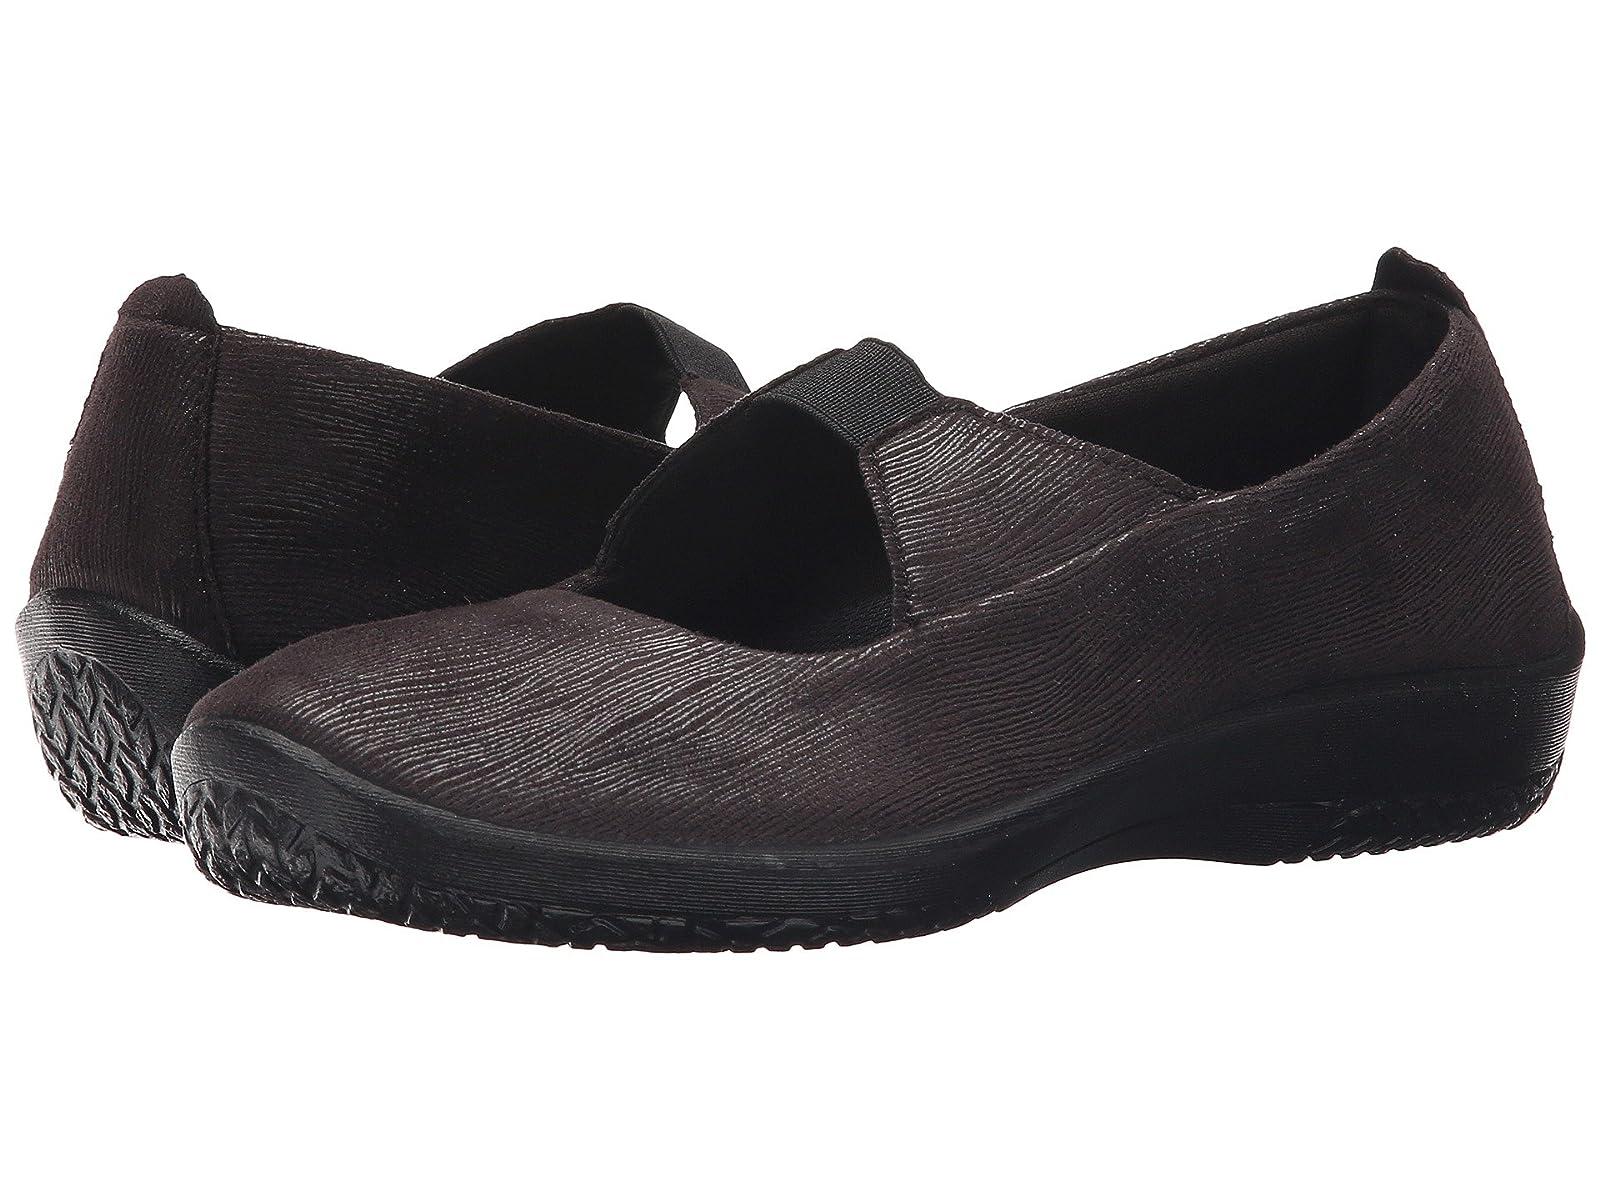 Arcopedico LeinaAtmospheric grades have affordable shoes